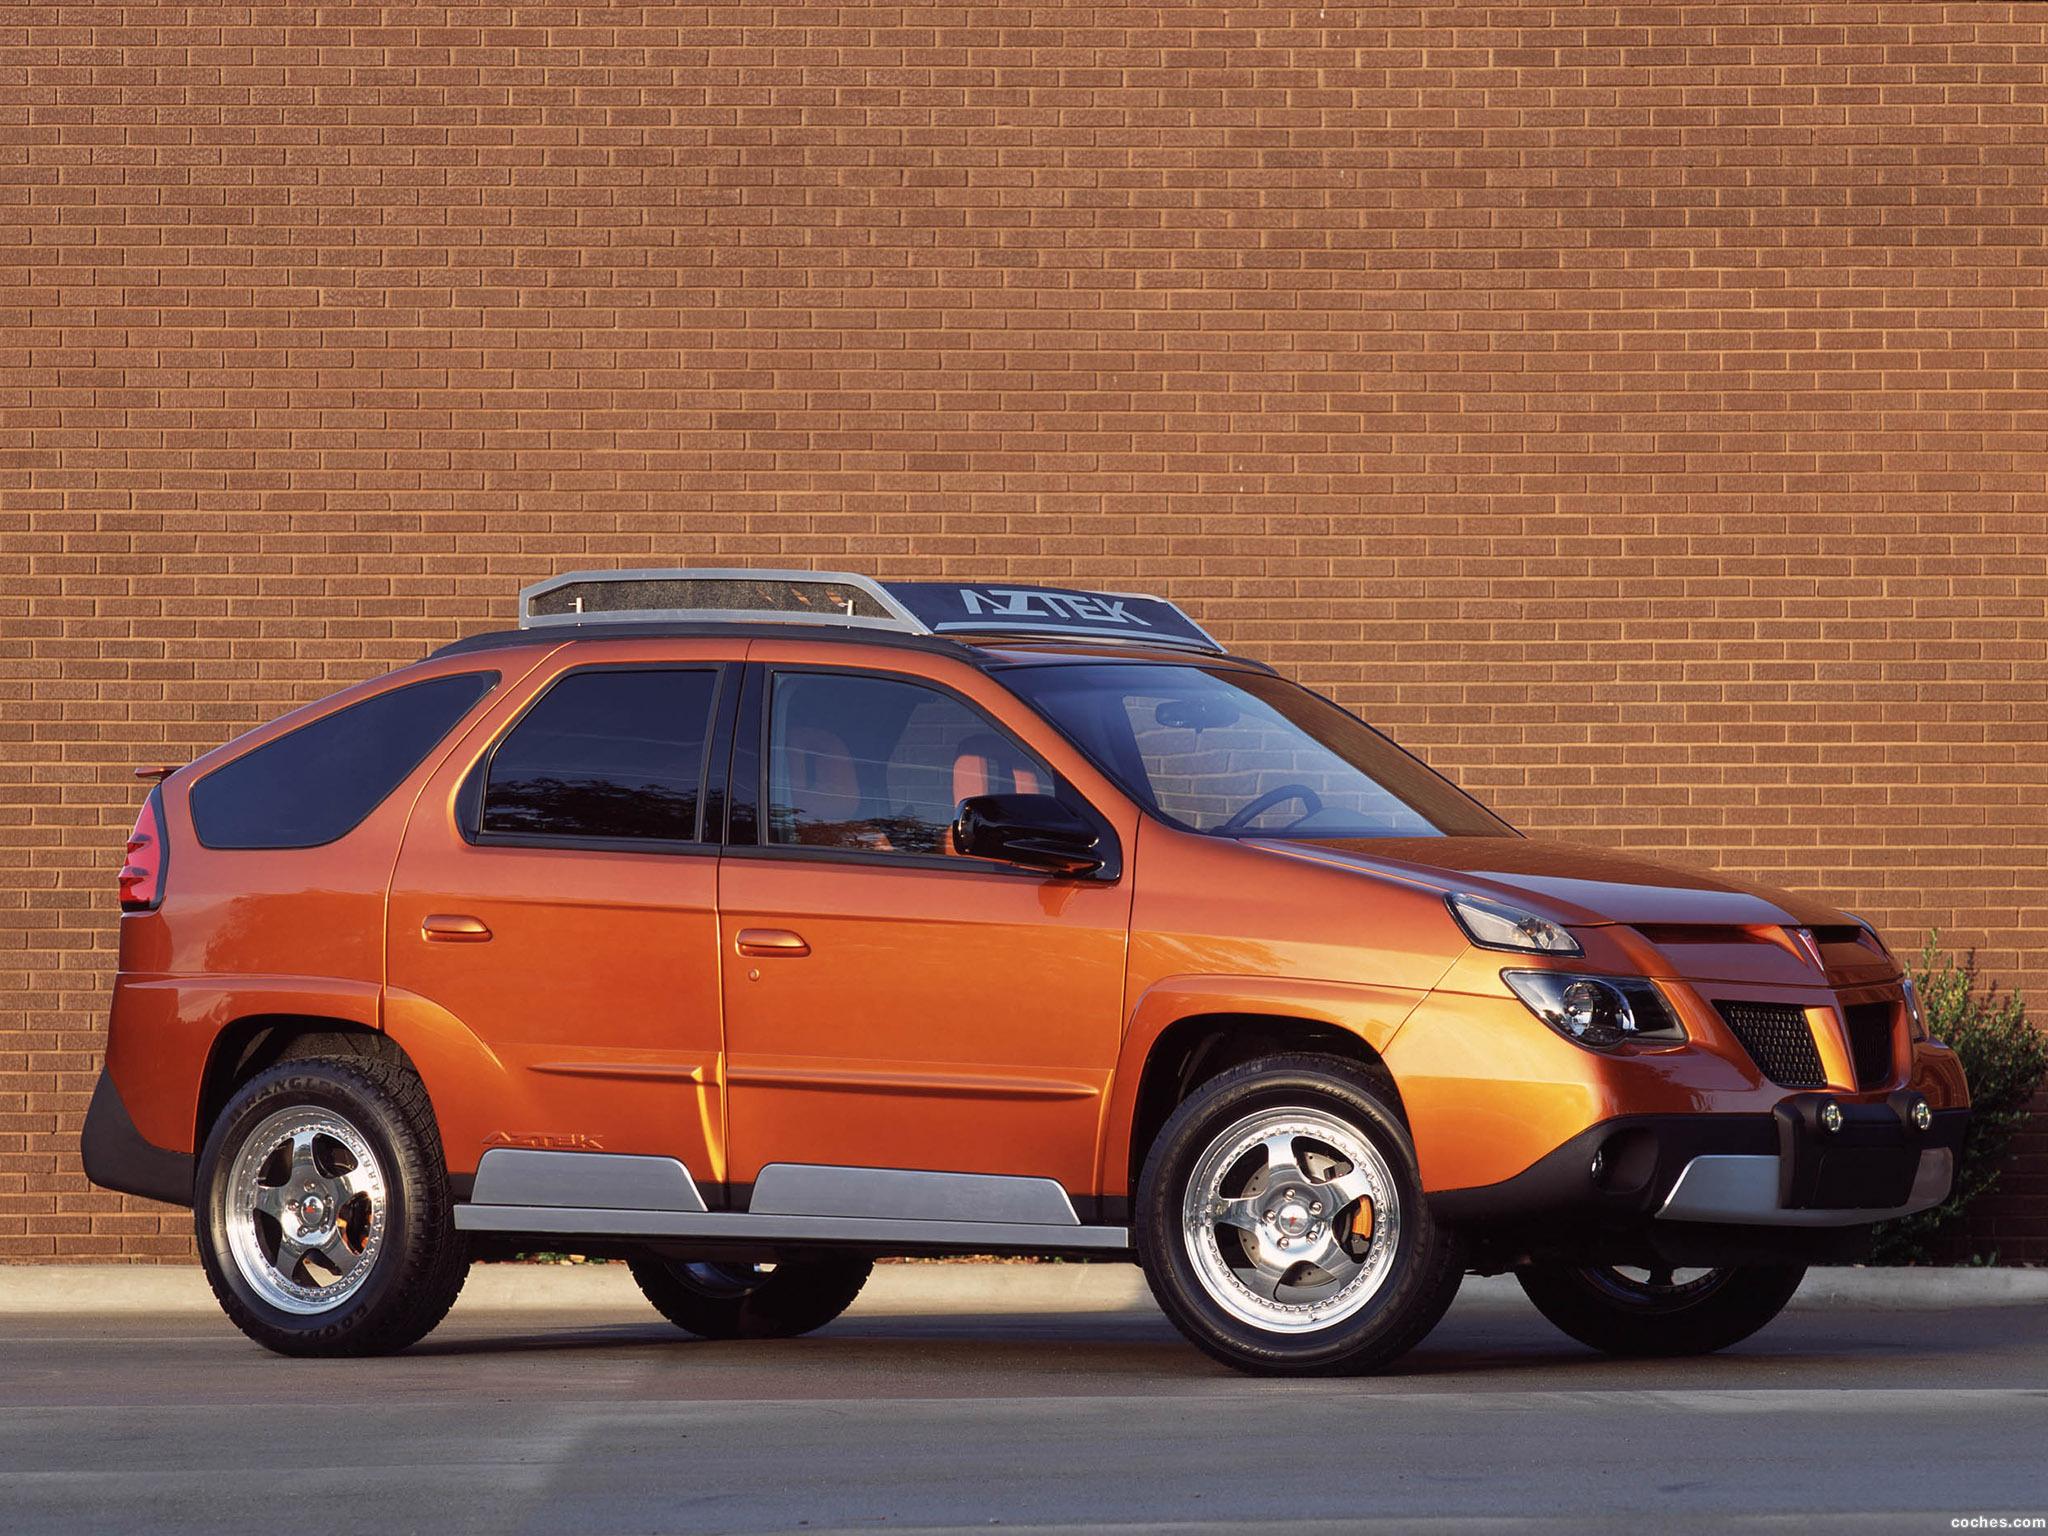 Foto 0 de Pontiac Aztek SRV 2001